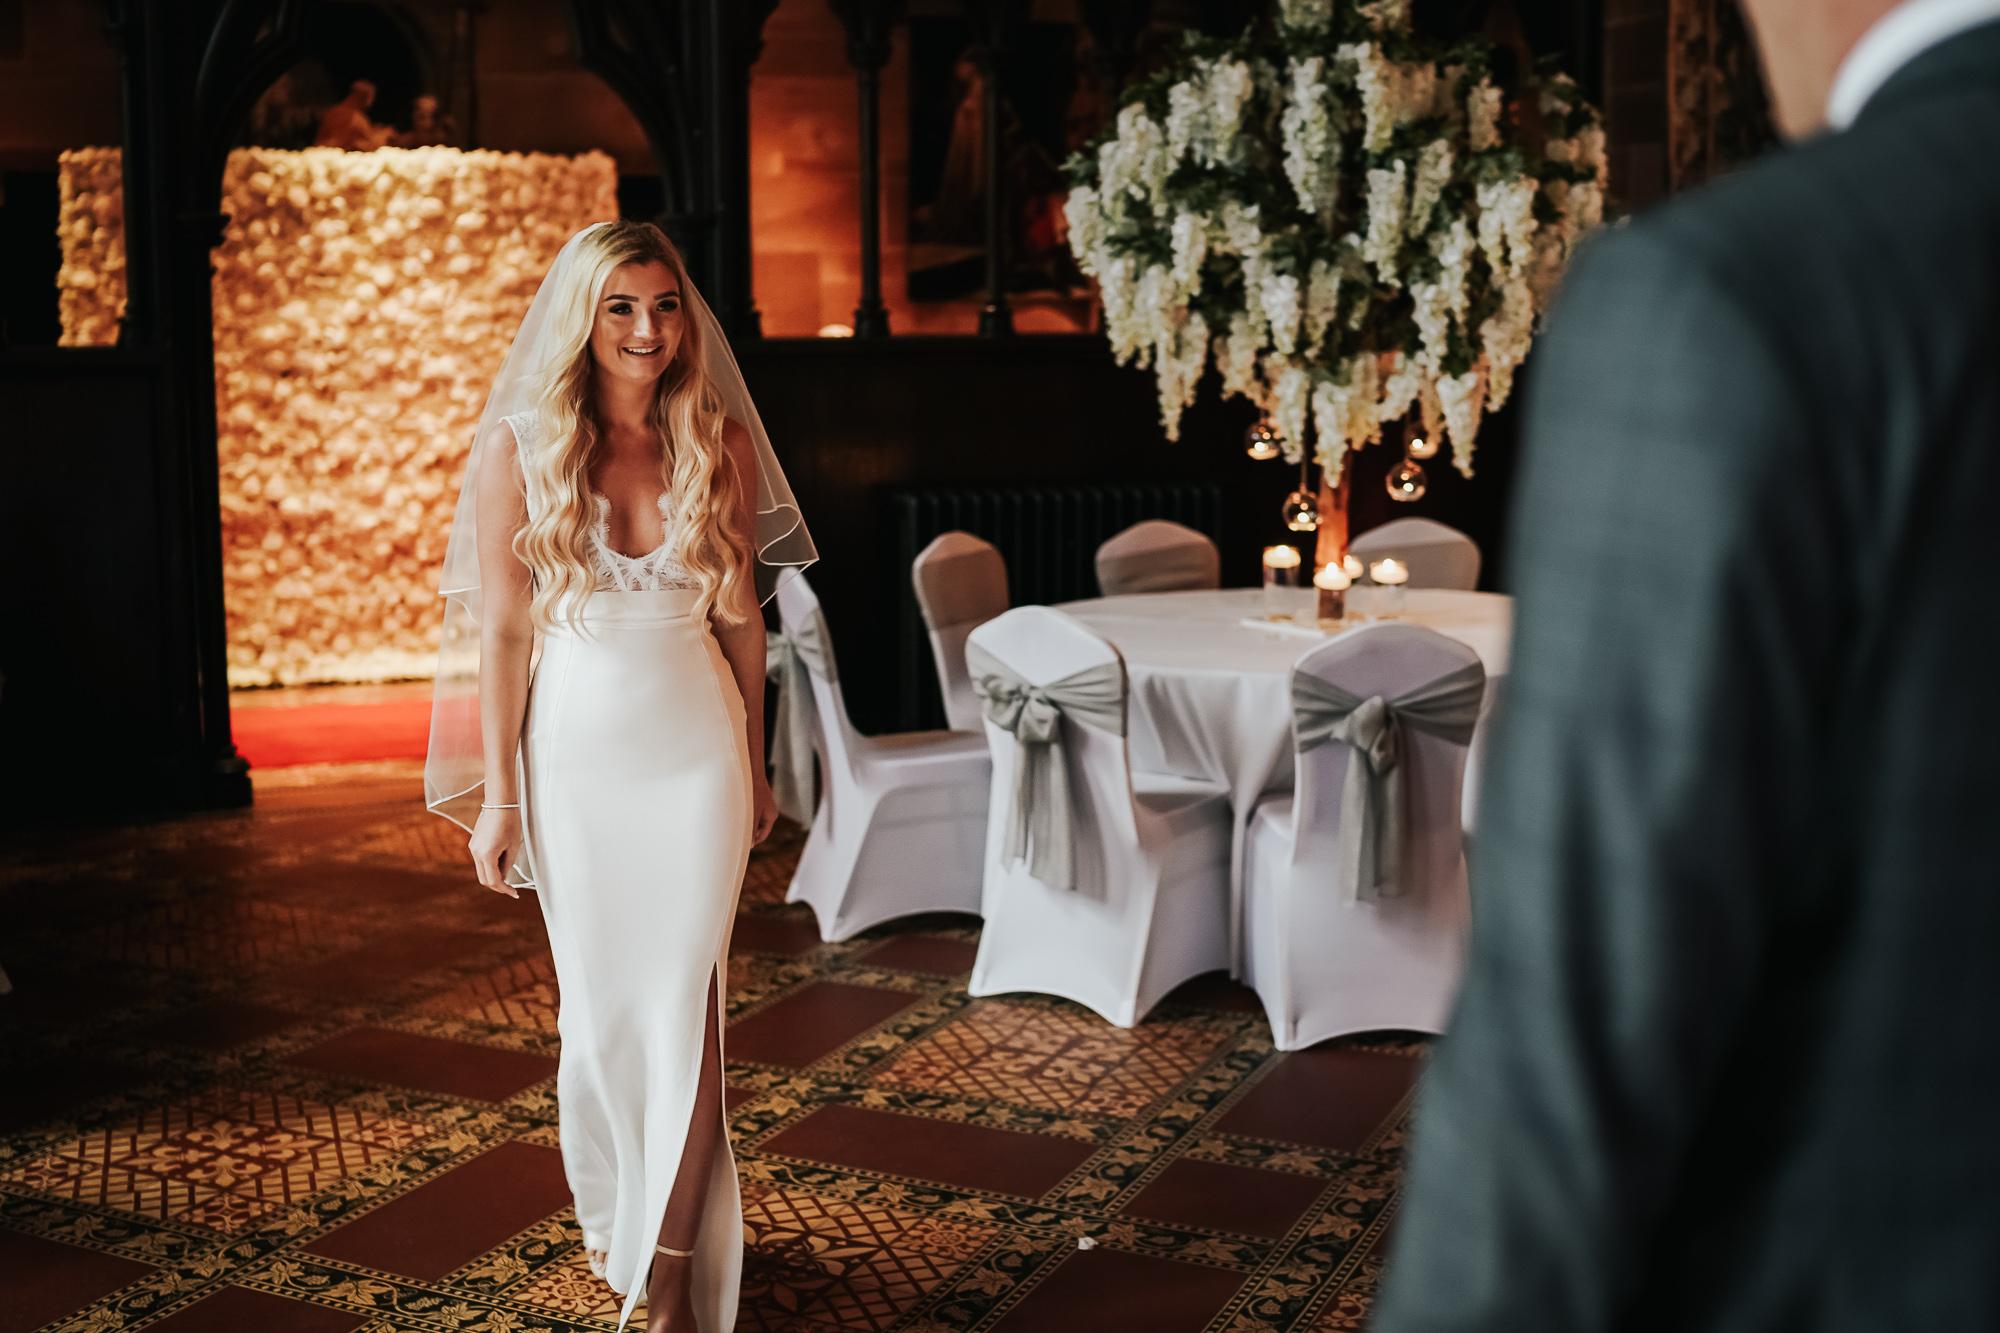 Peckforton Castle wedding photography cheshire wedding photographer (46 of 57).jpg